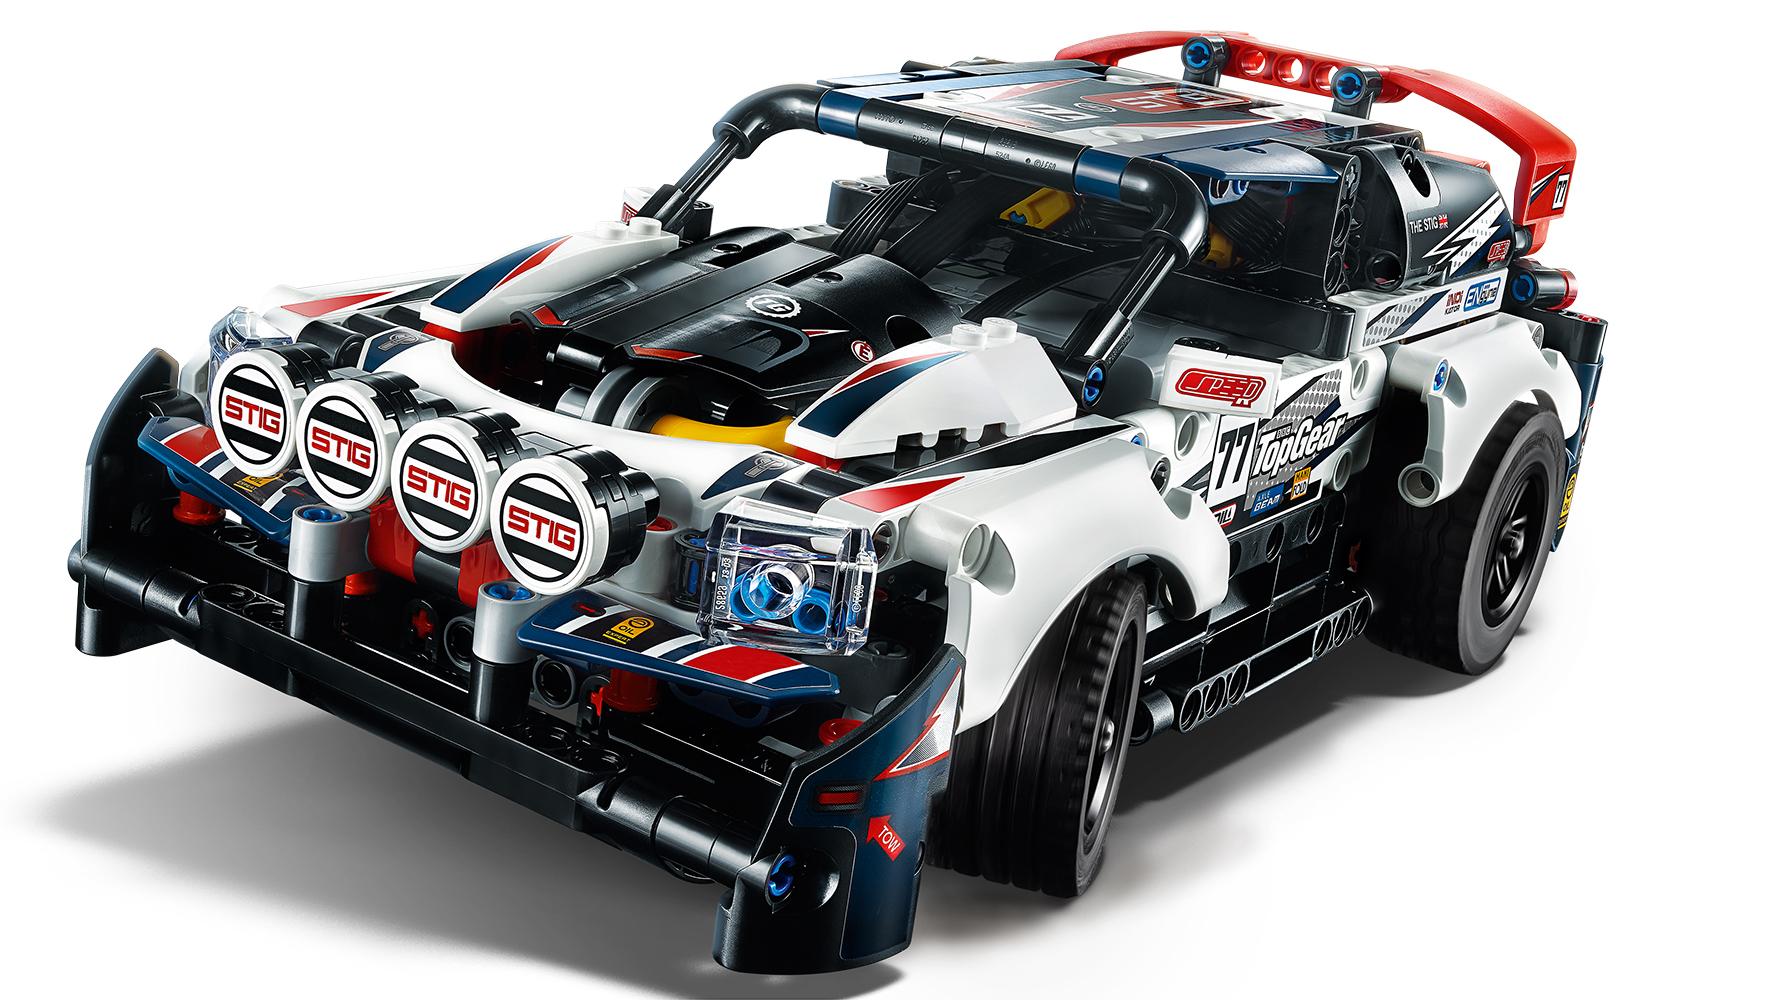 Technic - Voiture rallye Top Gear téléguidée